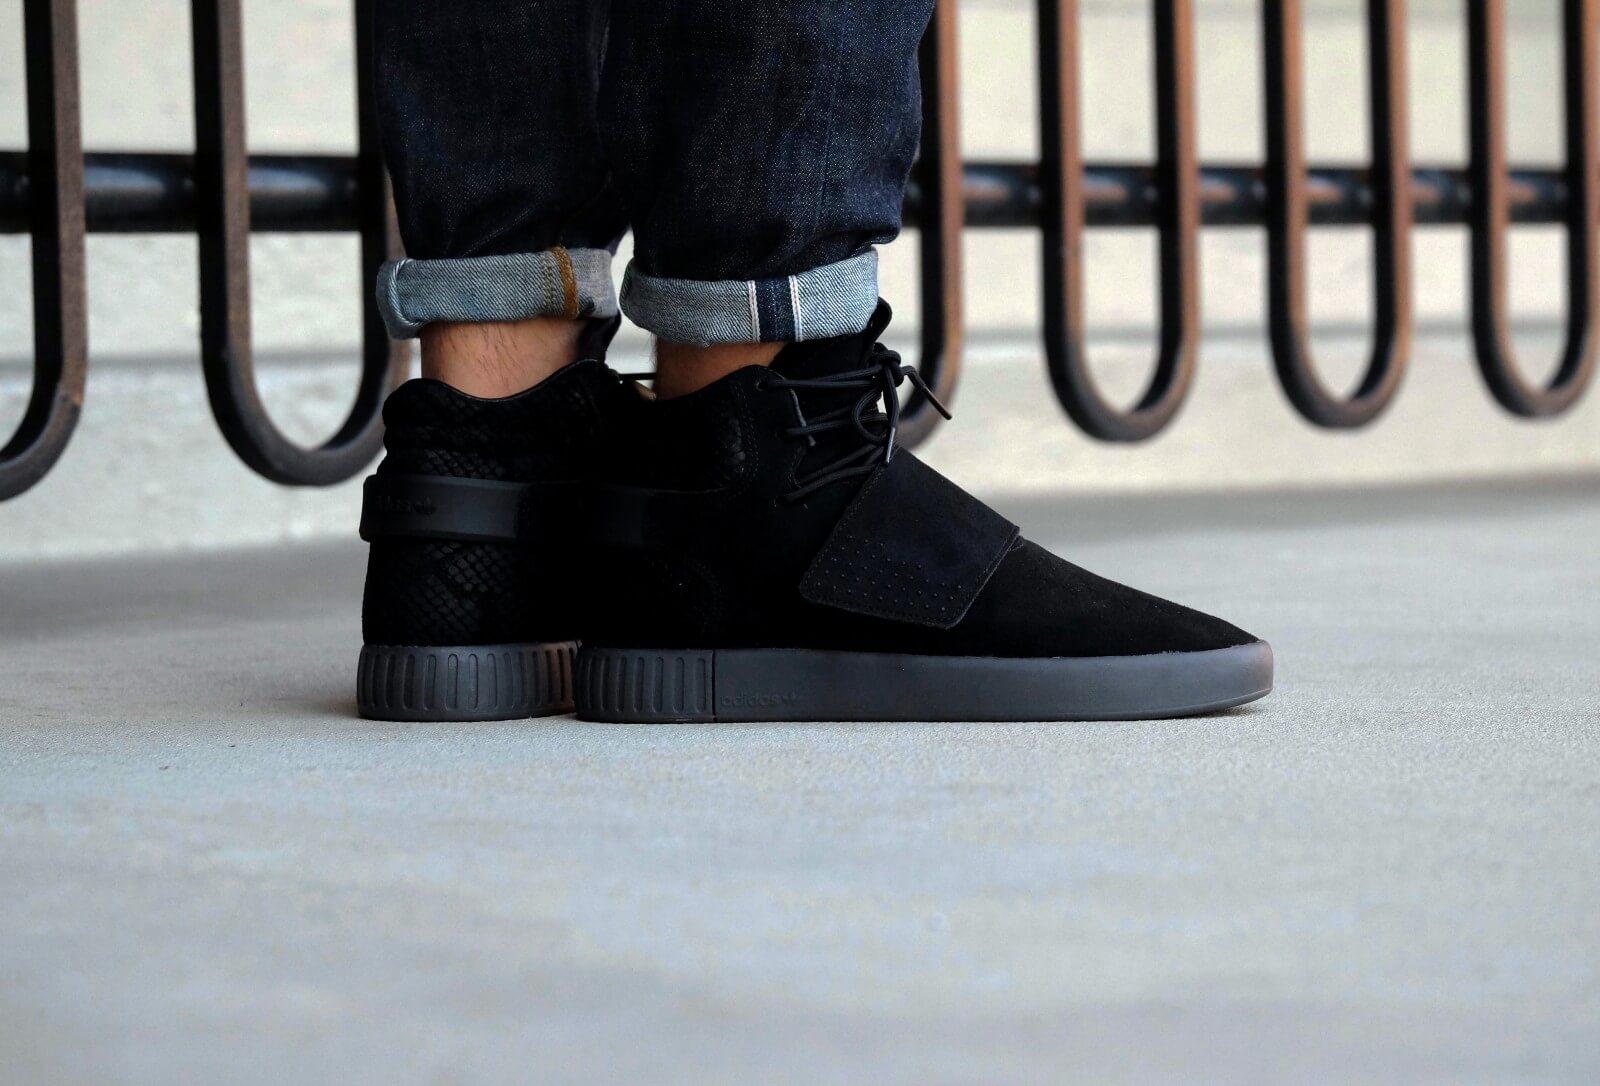 adidas tubular invader strap noire